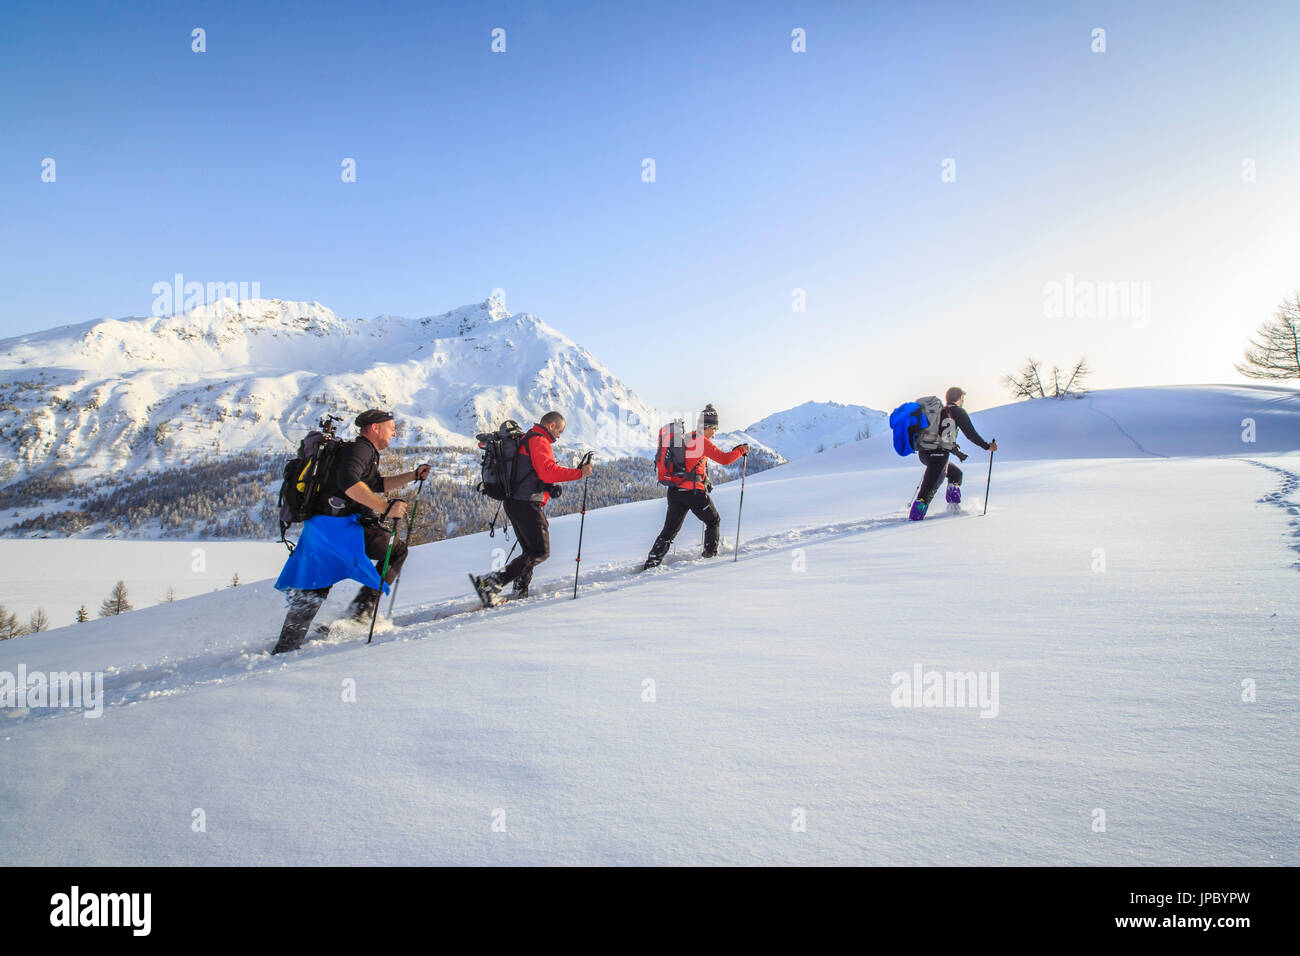 Snowshoe hikers are advancing in the fresh snow. Maloja Pass. Engadine. Switzerland. Europe - Stock Image